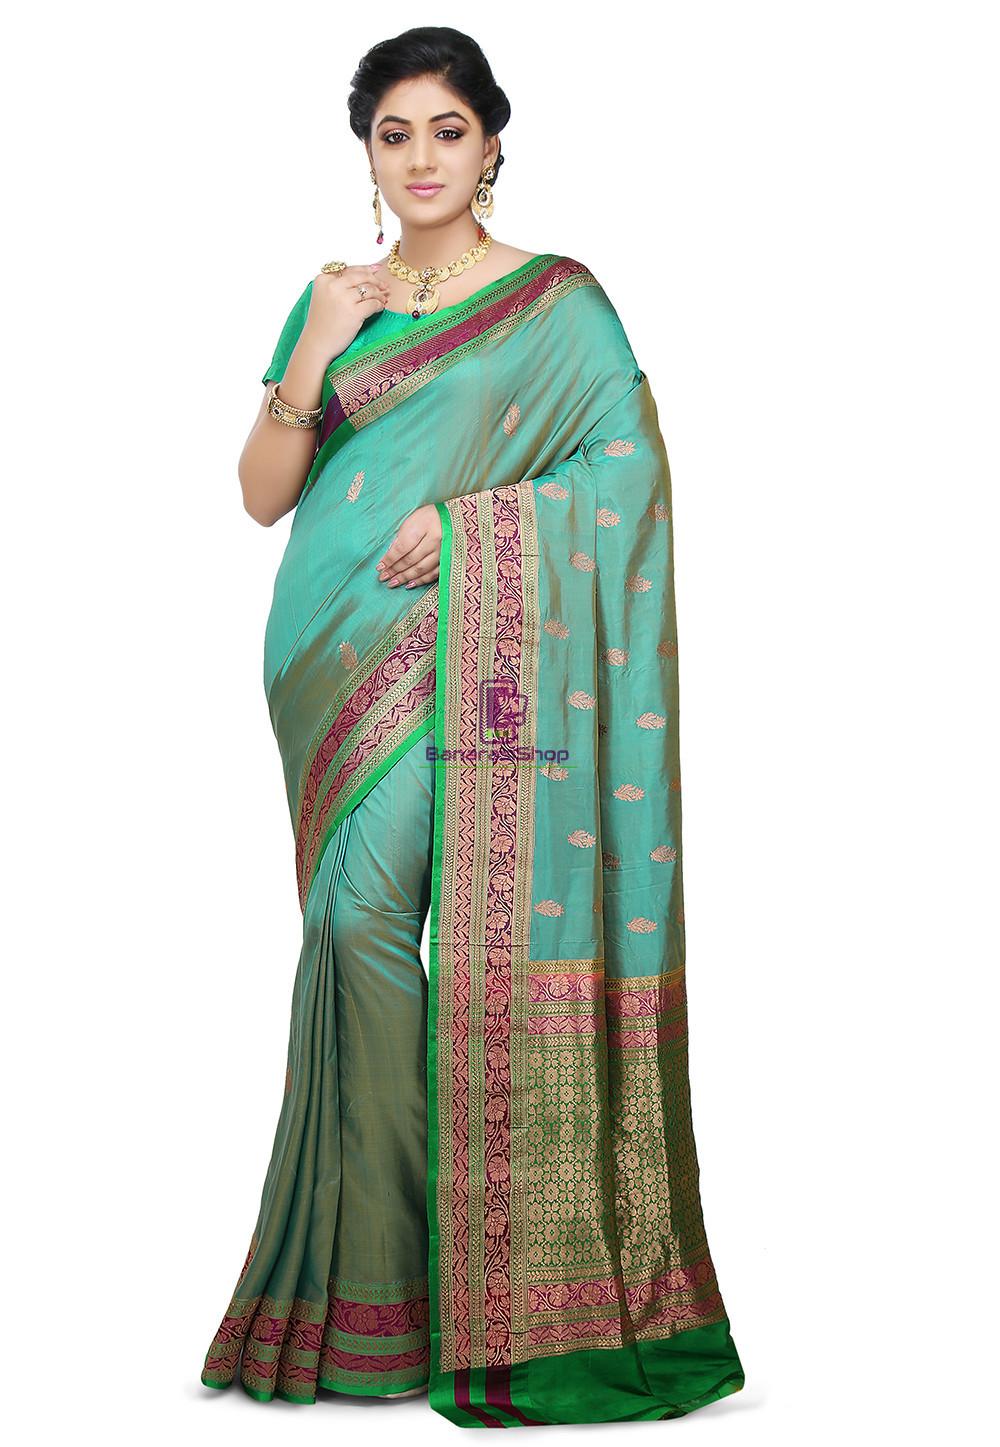 Banarasi Pure Katan Silk Handloom Saree in Teal Blue 1